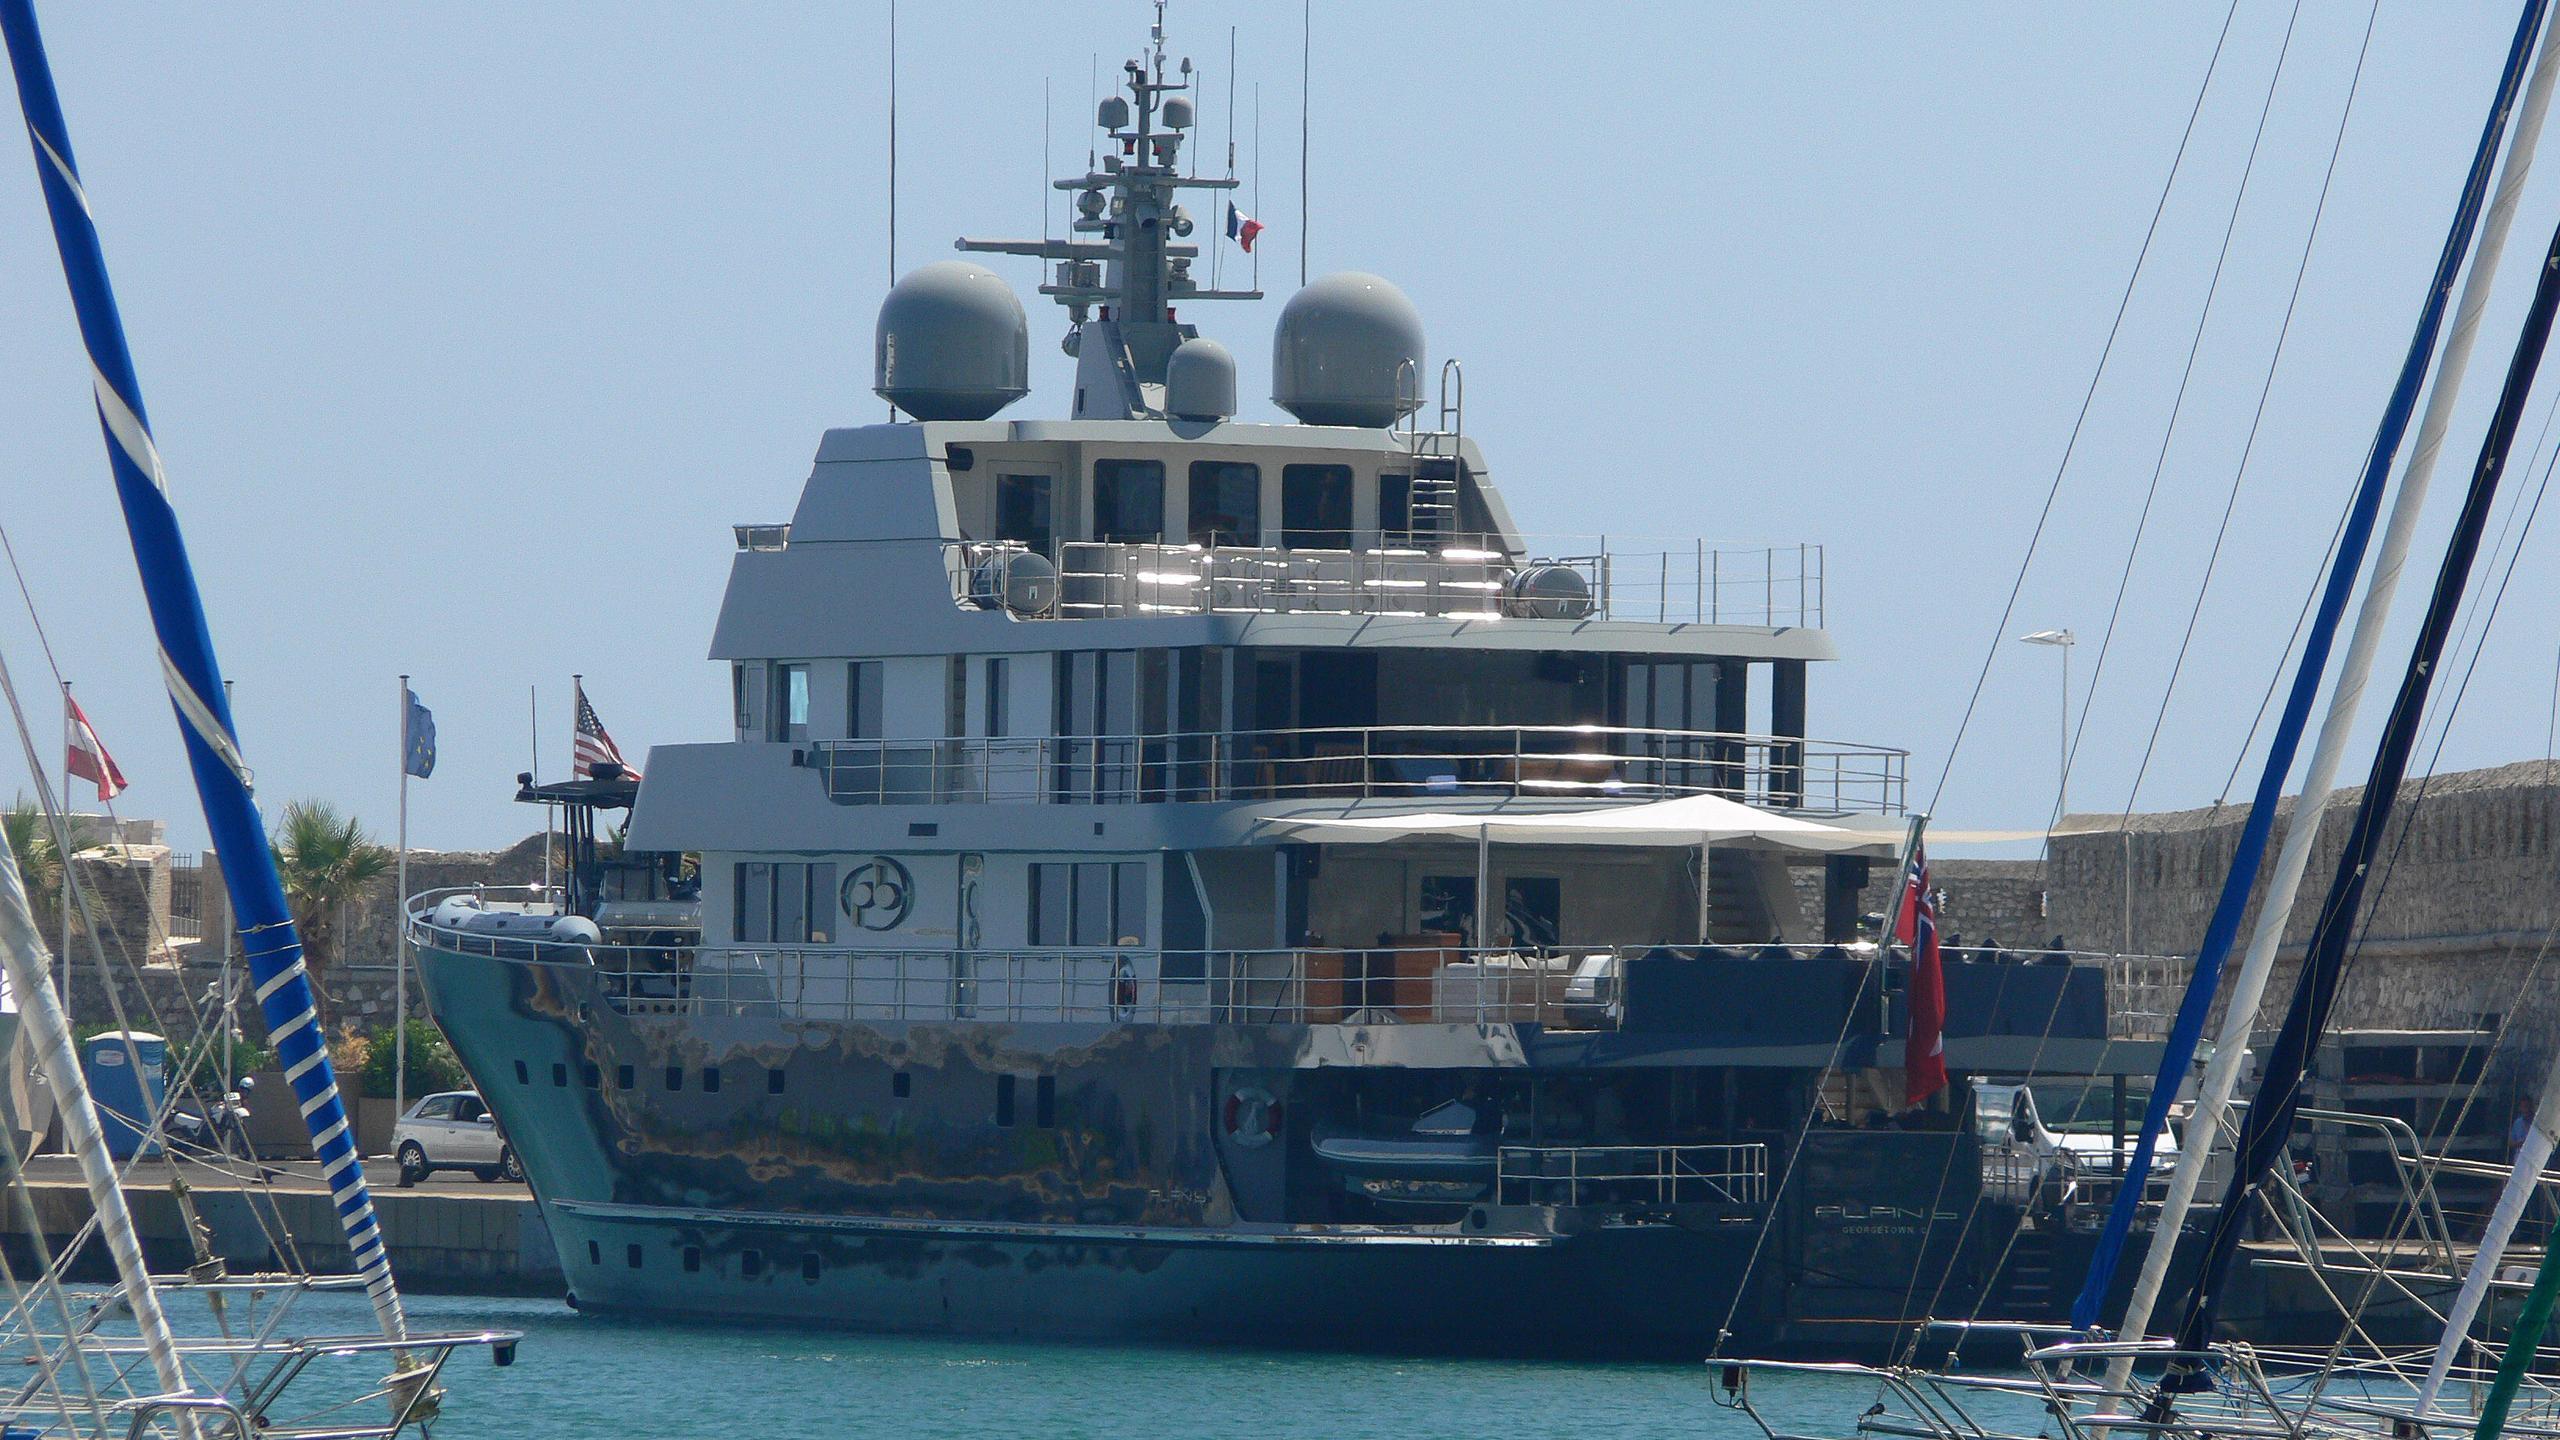 plan-b-explorer-yacht-australian-naval-1973-50m-stern